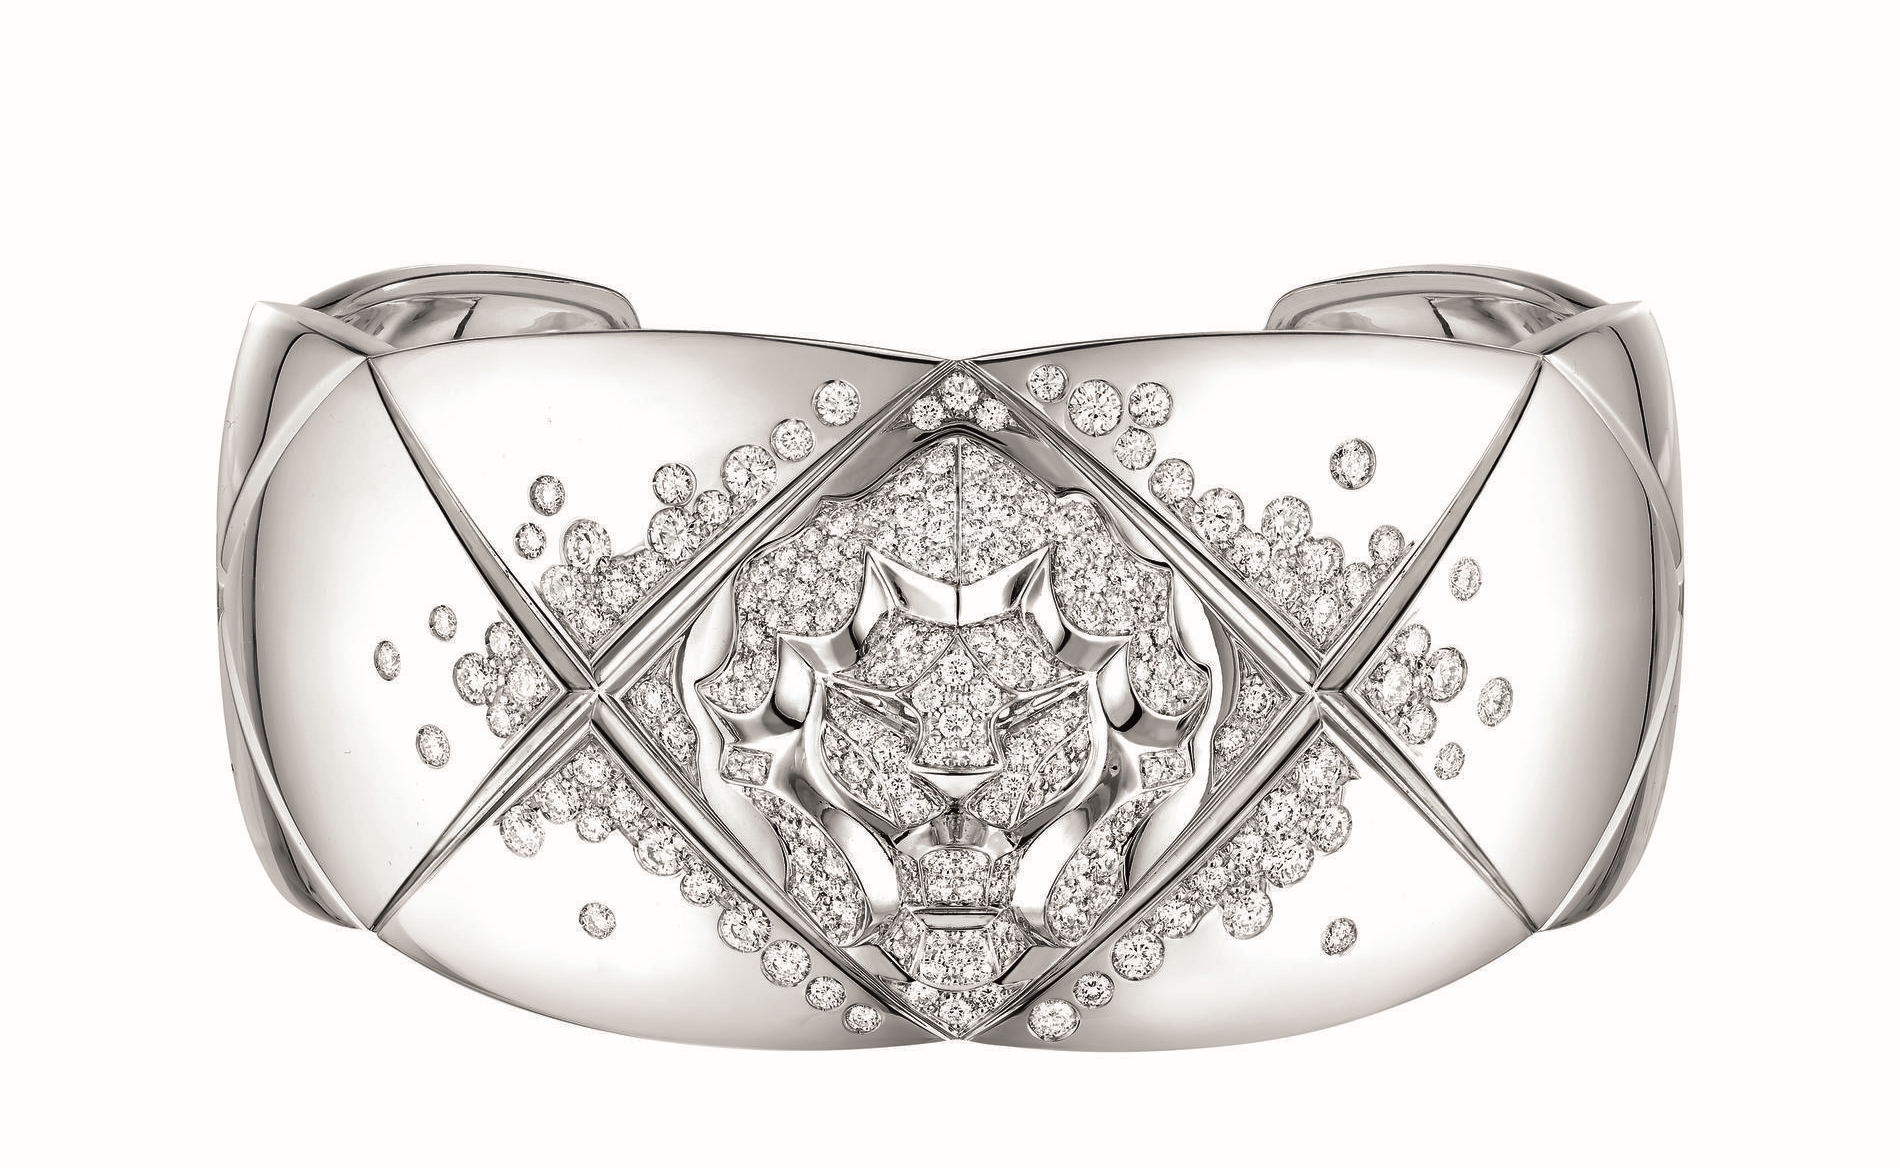 Keira Knightley Chanel Coco Crush Bracelet Lion2